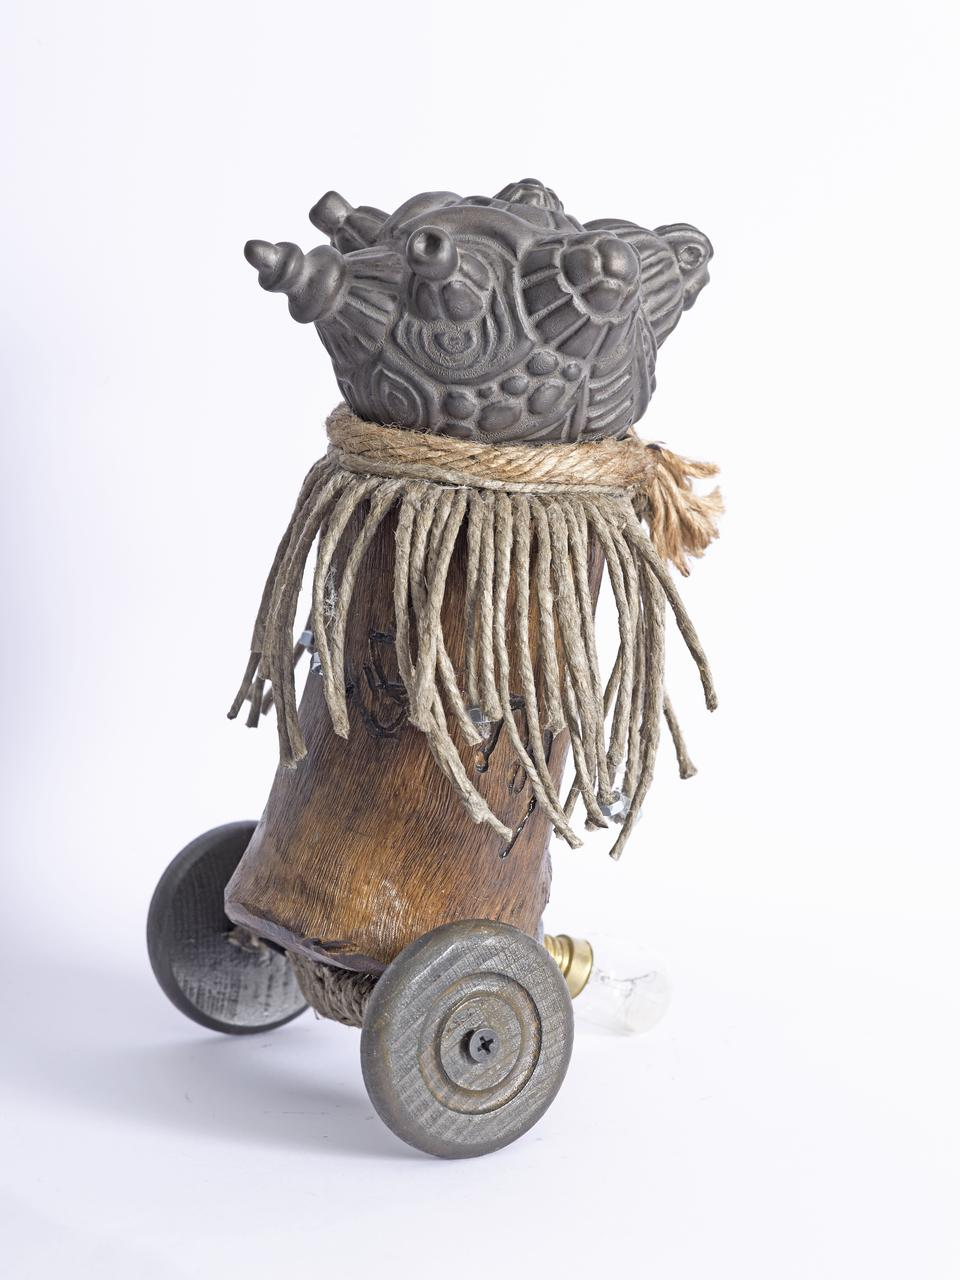 Marios Fournaris, Post-Industrial Artefact  Of The Intercultural Perception N.02,  ceramic, wood, iron, jute, electic bulb, 2016